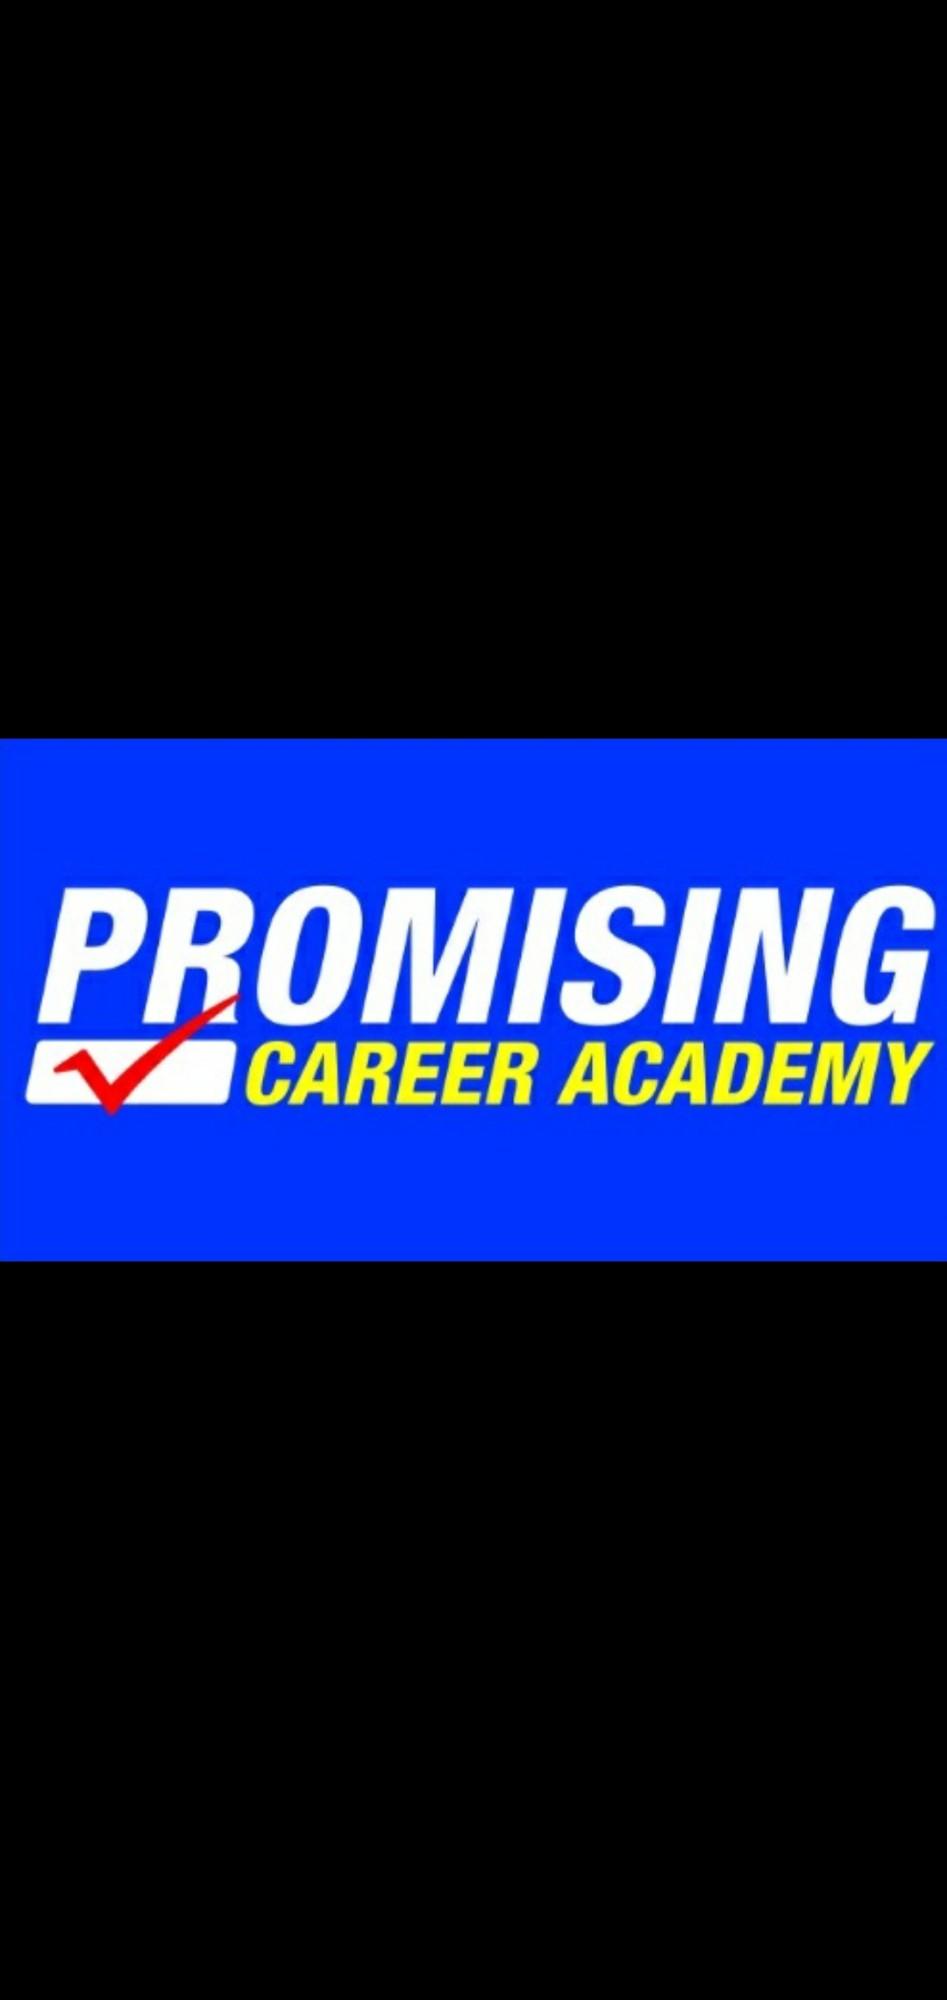 Promising Career Academy in Virar West, Mumbai-401303   Sulekha